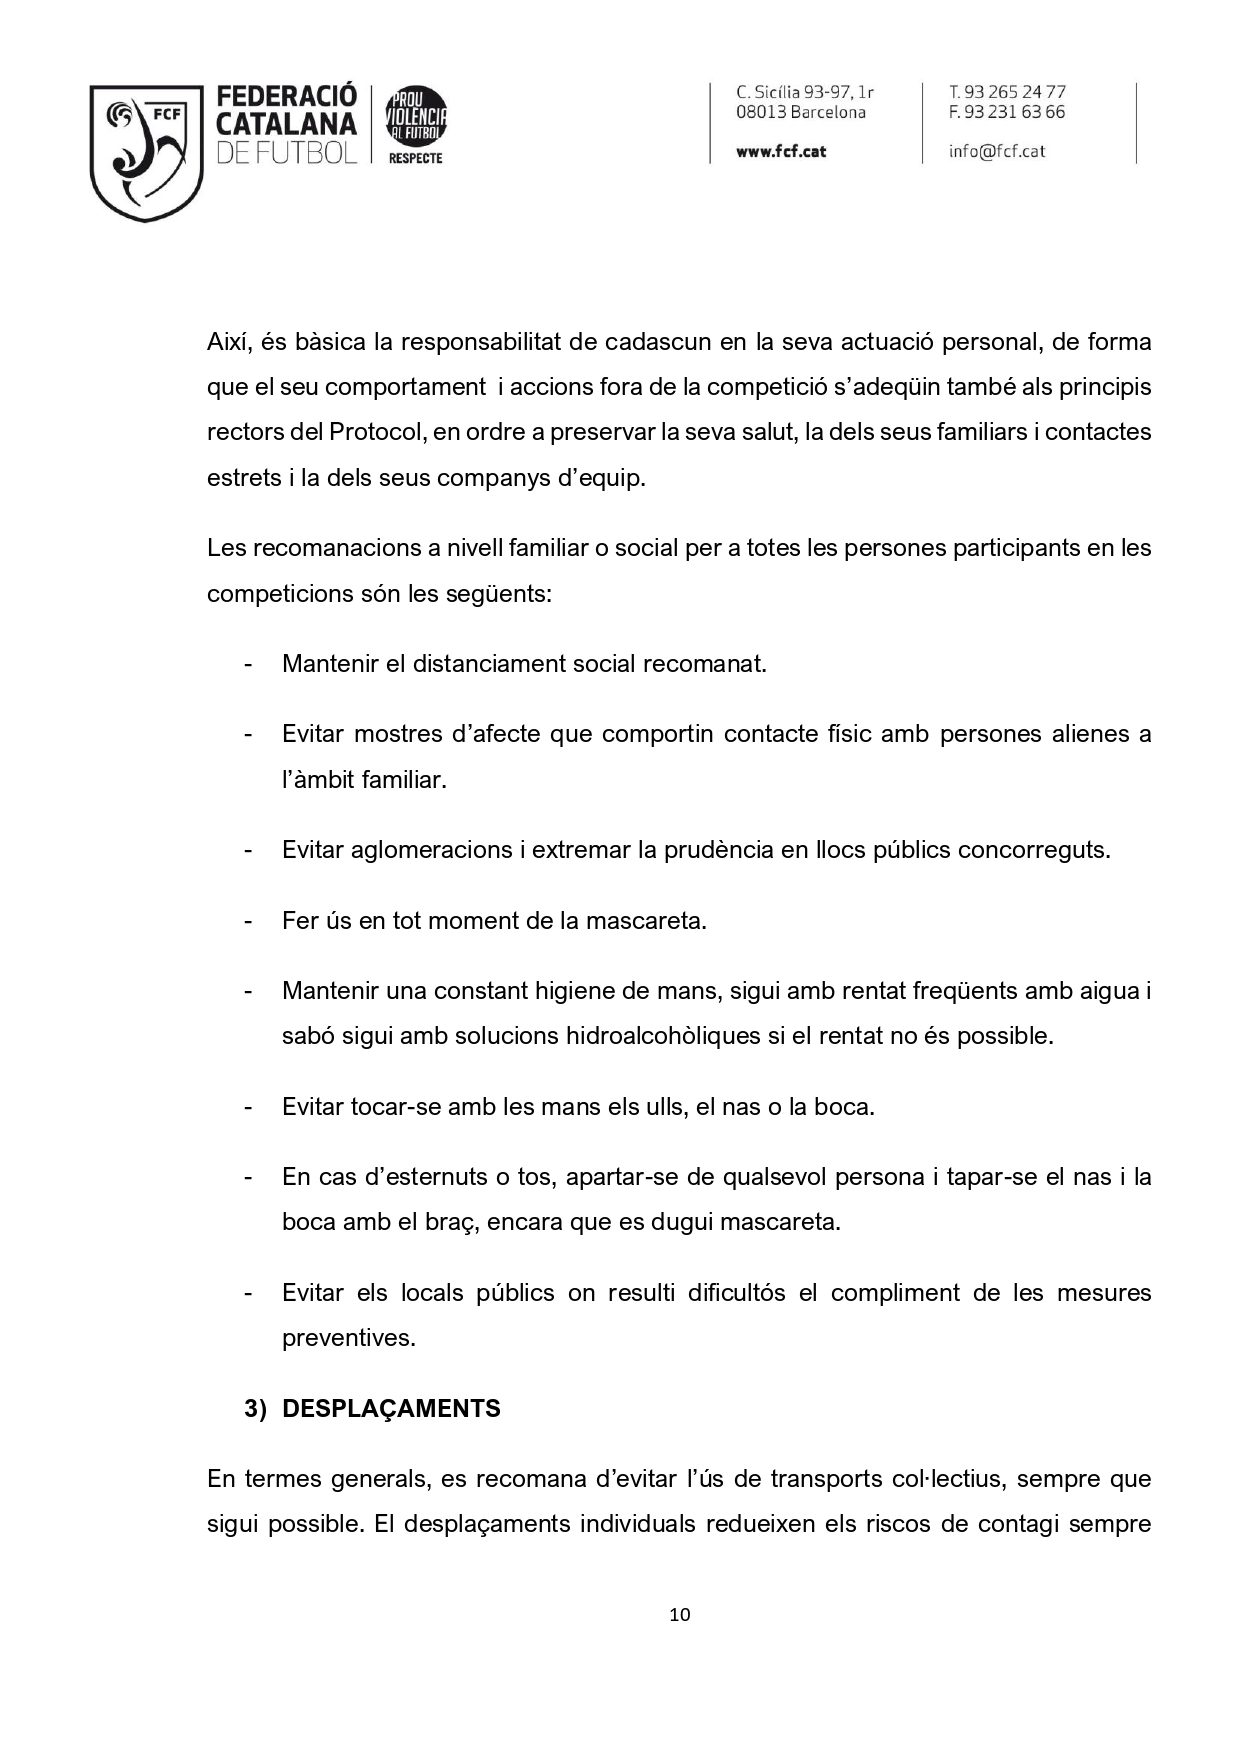 Circular Actualització Protocol Competicions _set21_2_page-0010